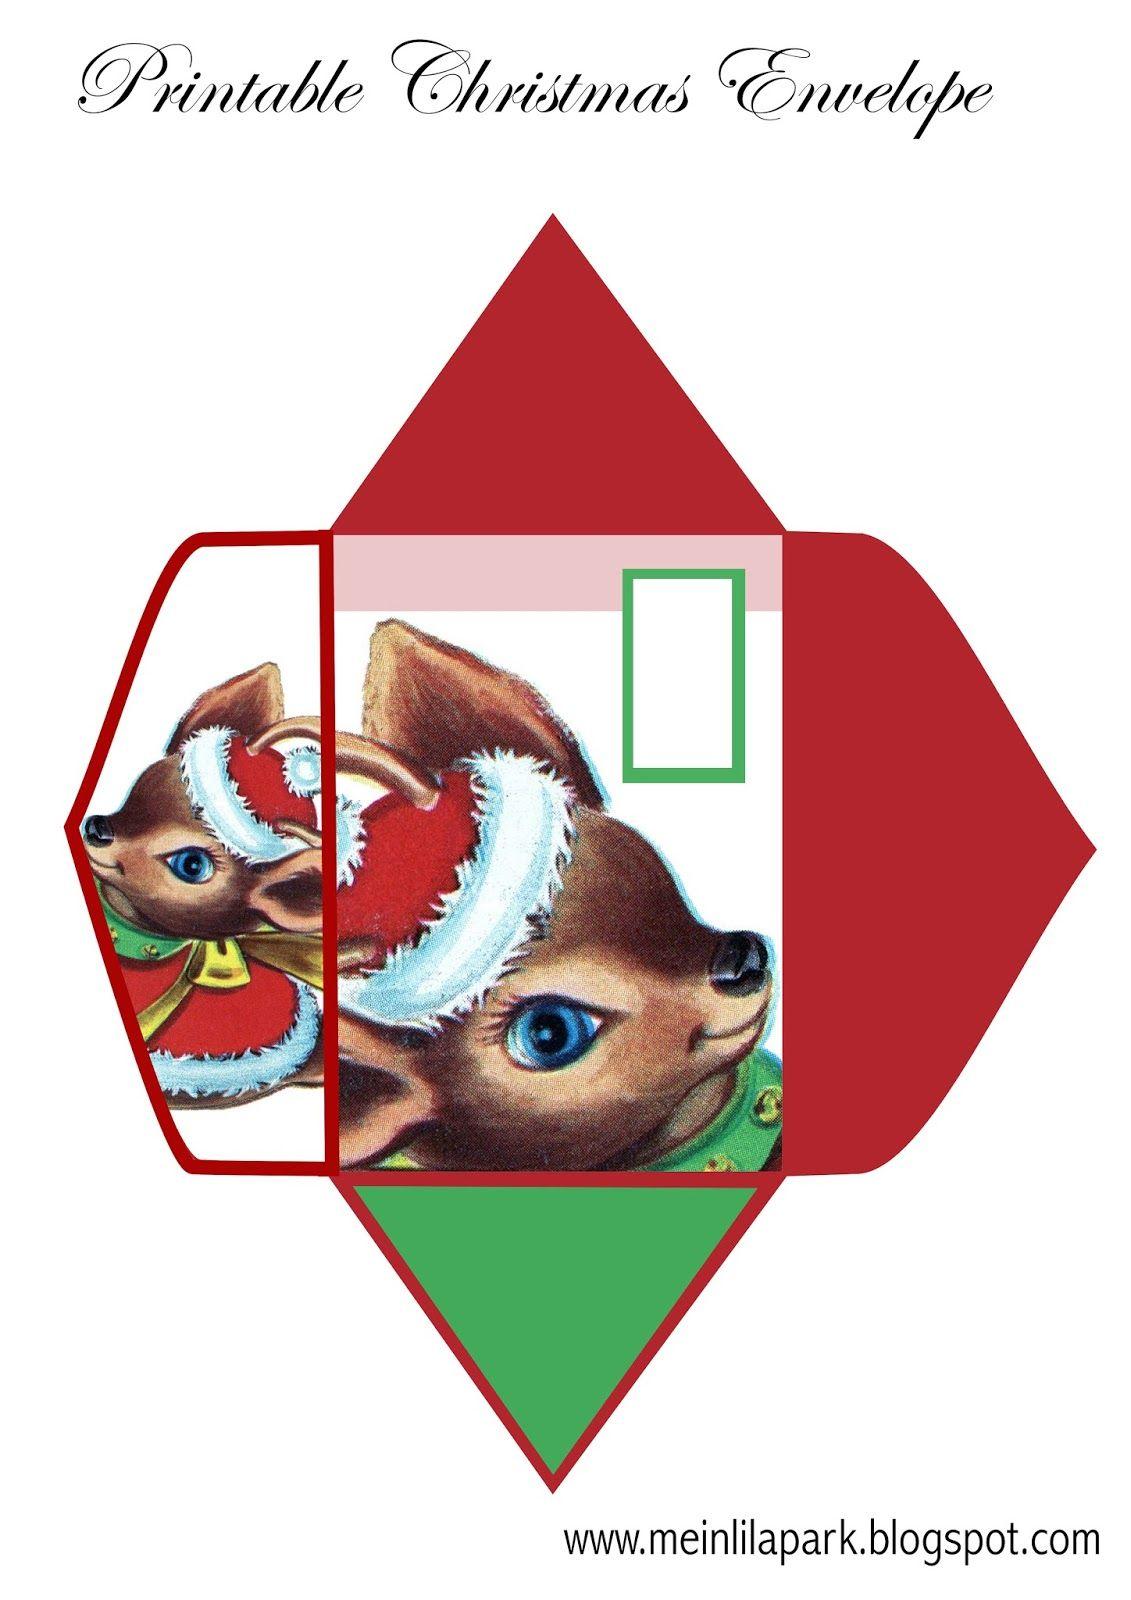 photograph regarding Christmas Envelopes Free Printable identified as Free of charge printable Christmas envelope for young children - ausdruckbarer